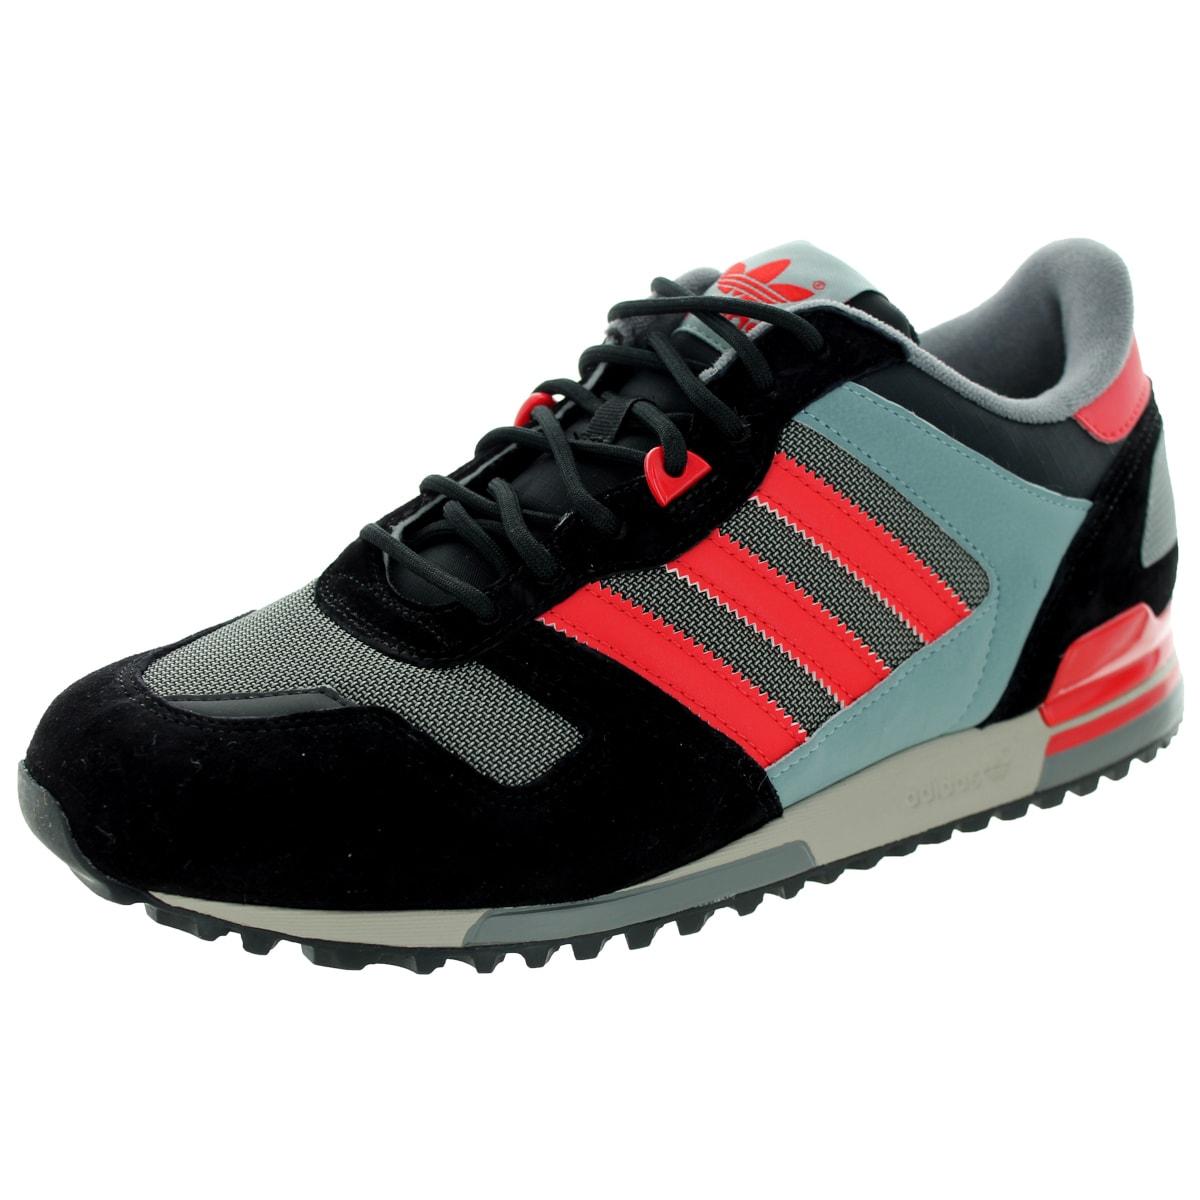 Adidas Men's Zx 700 Originals Black/Tomato/ Running Shoe